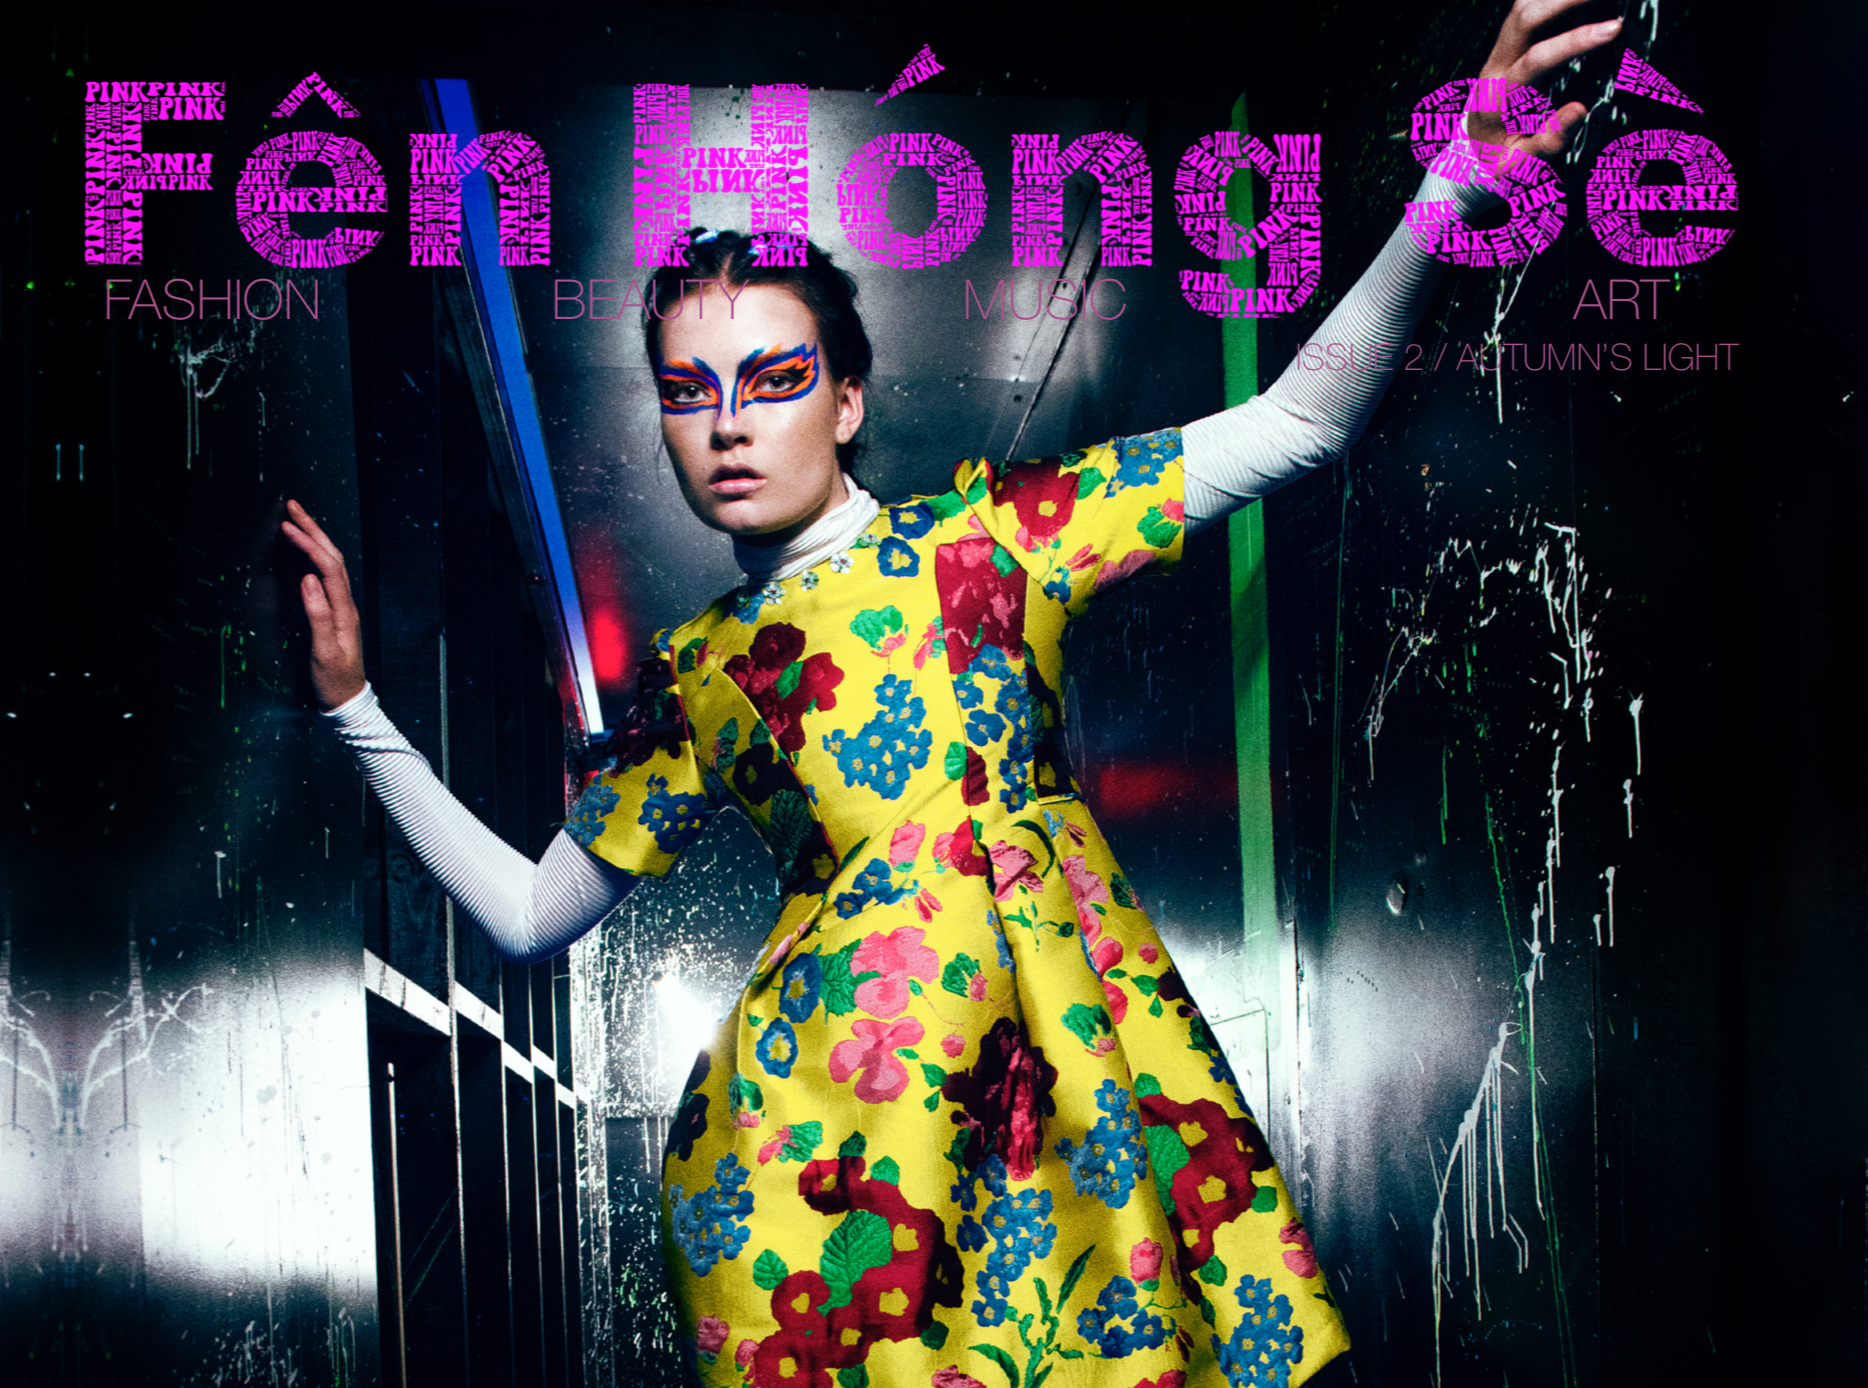 Fen Hong Se